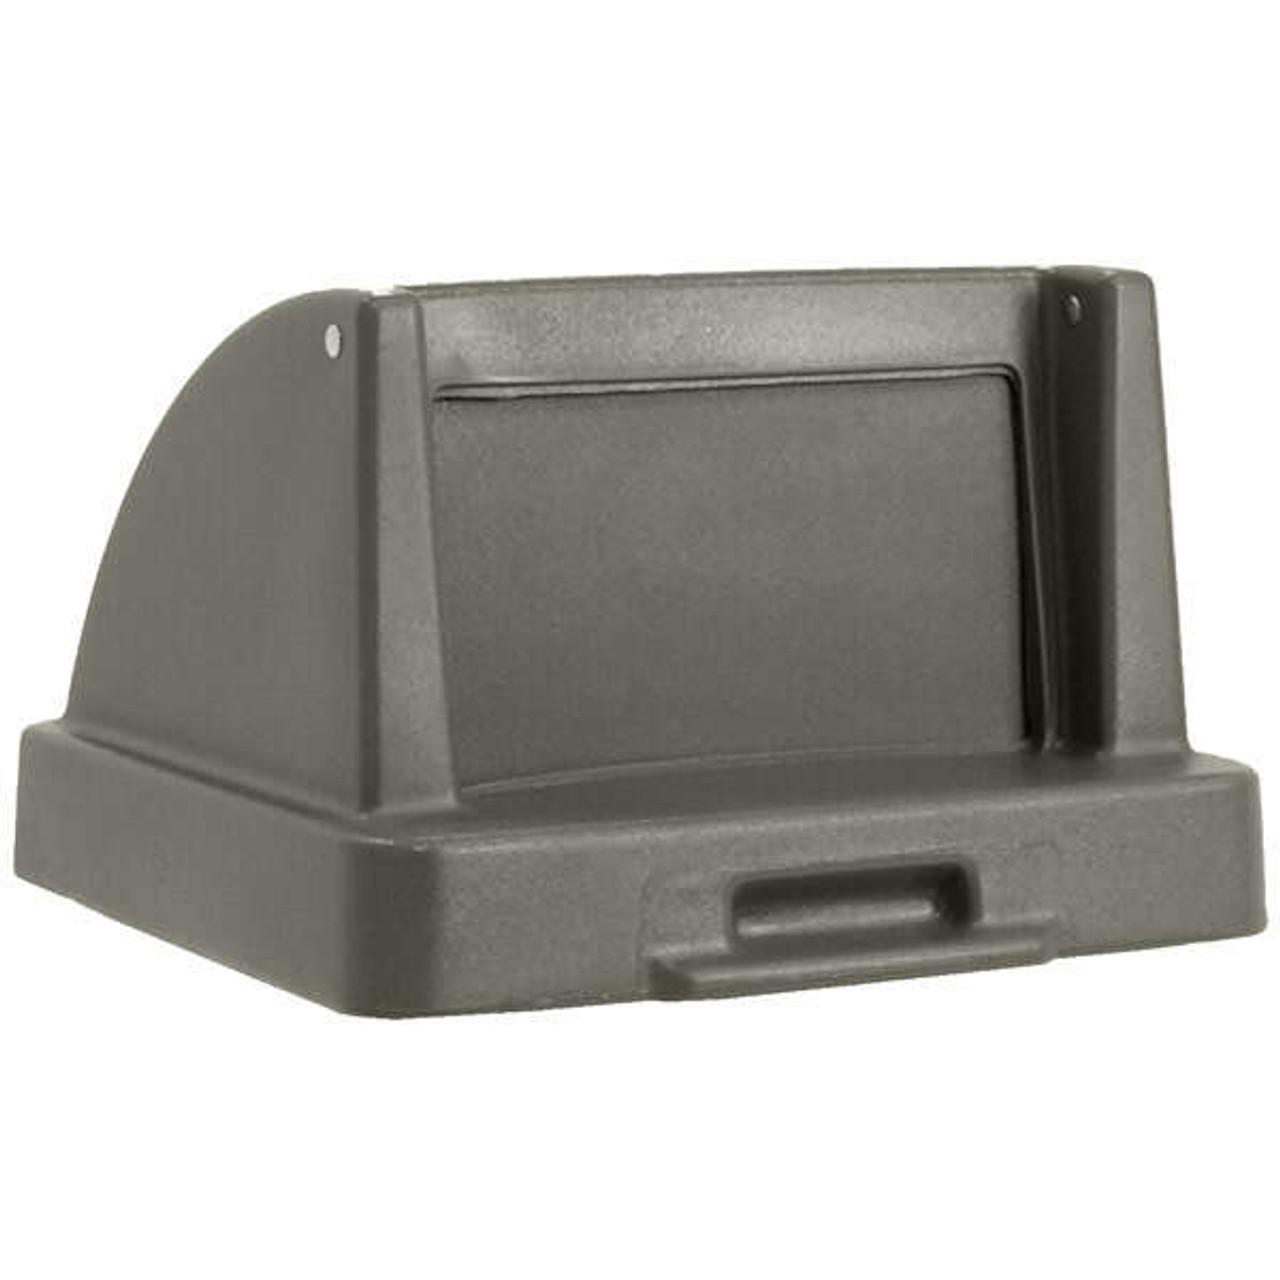 20.5 x 20.5 Push Door Plastic Lids TF1405QS for Square Trash Cans Gray